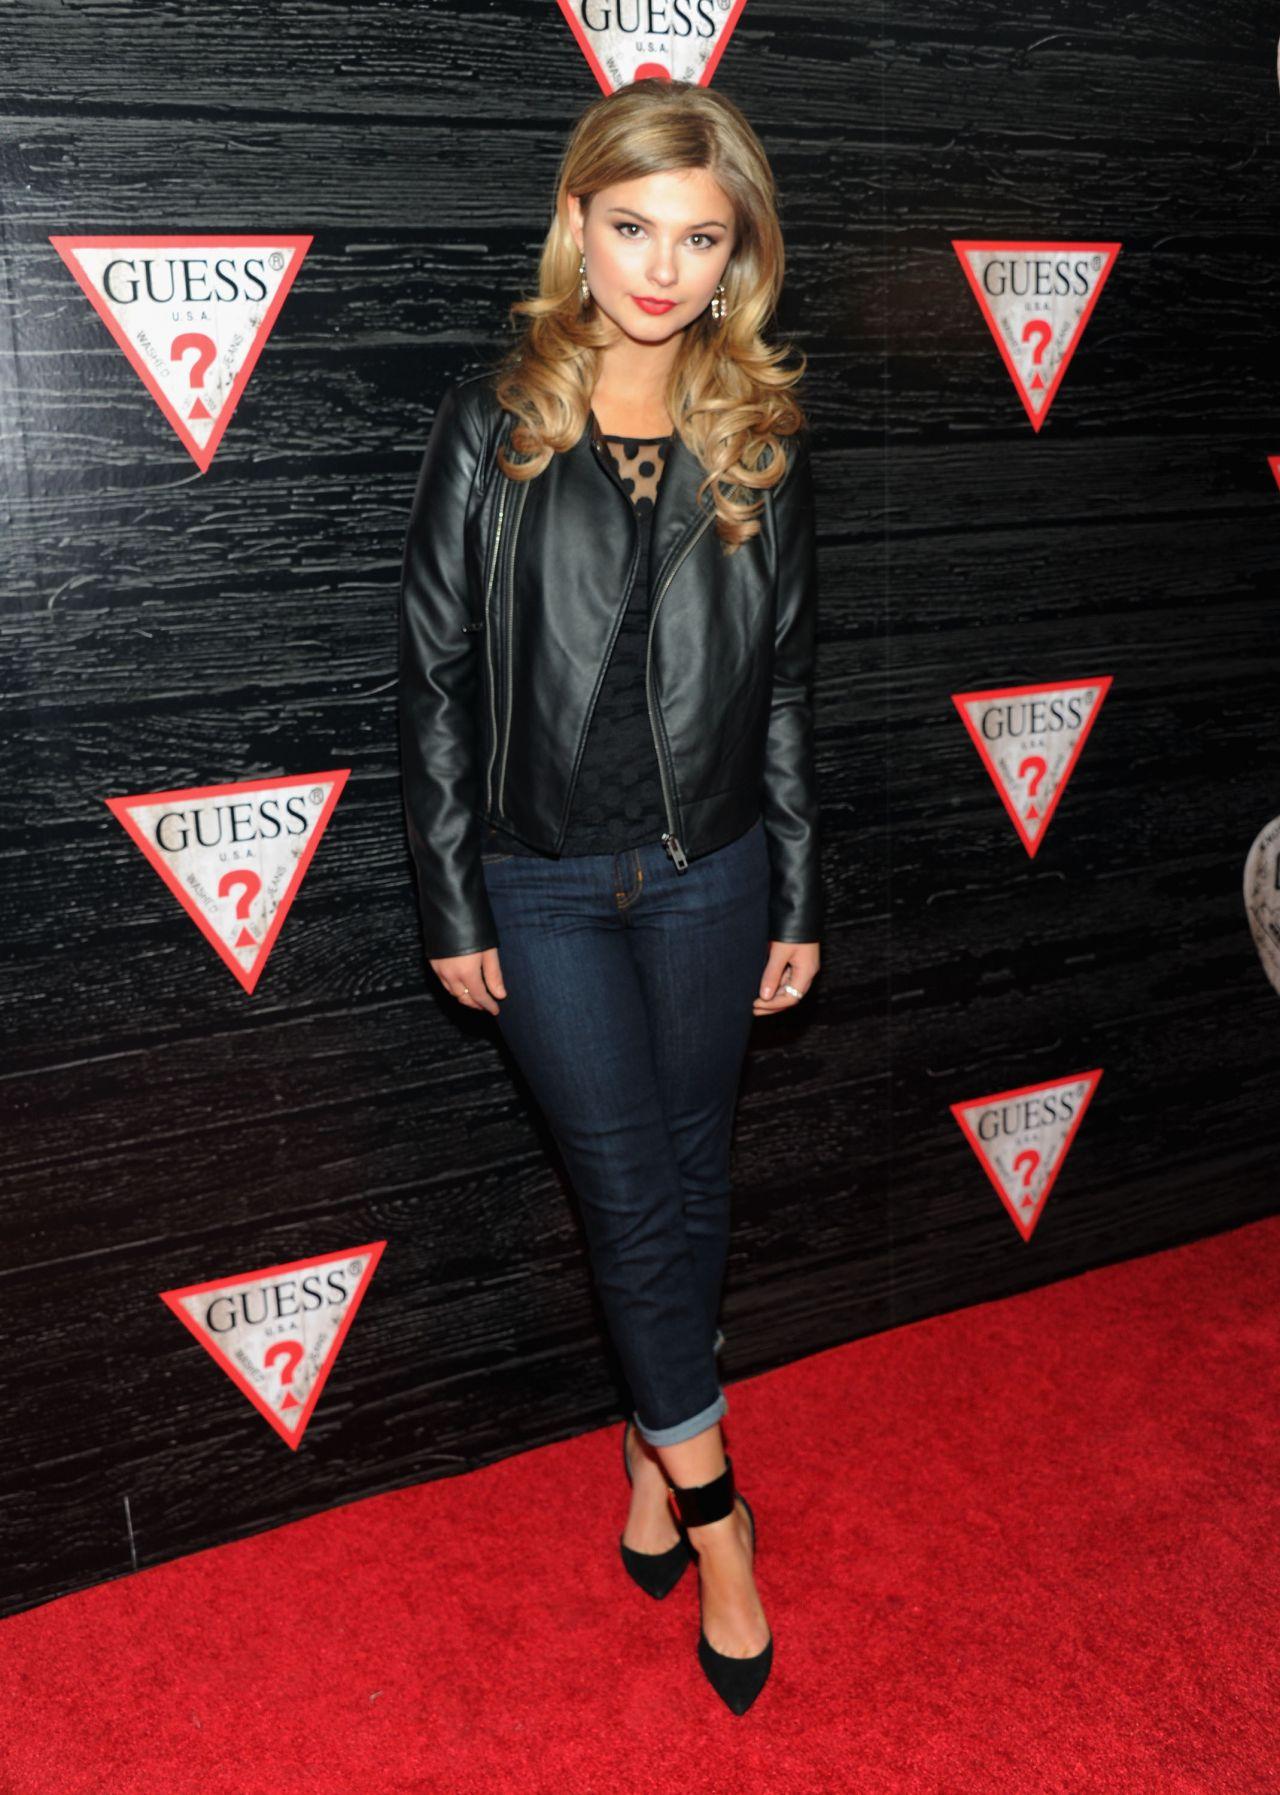 Stefanie Scott Attends Guess New York Fashion Week